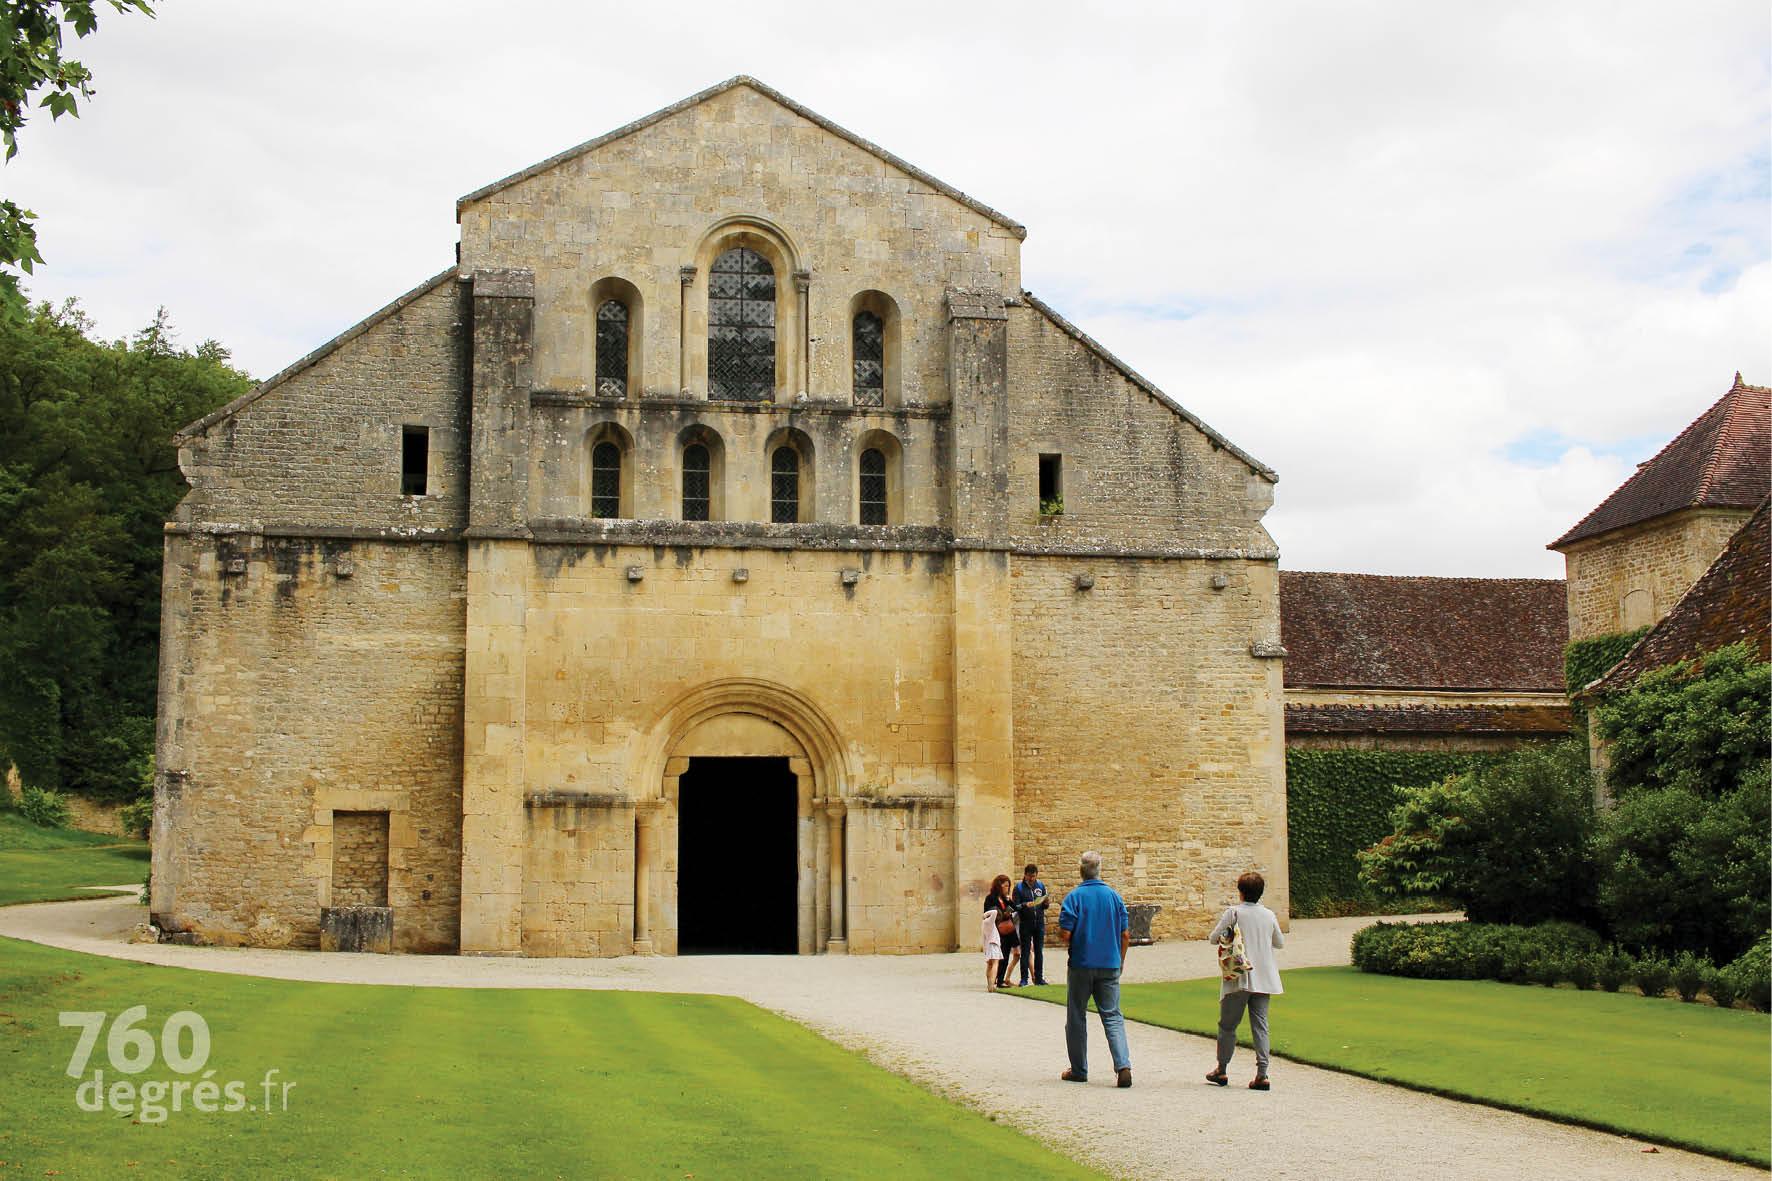 760degres-abbaye-fontenay-02